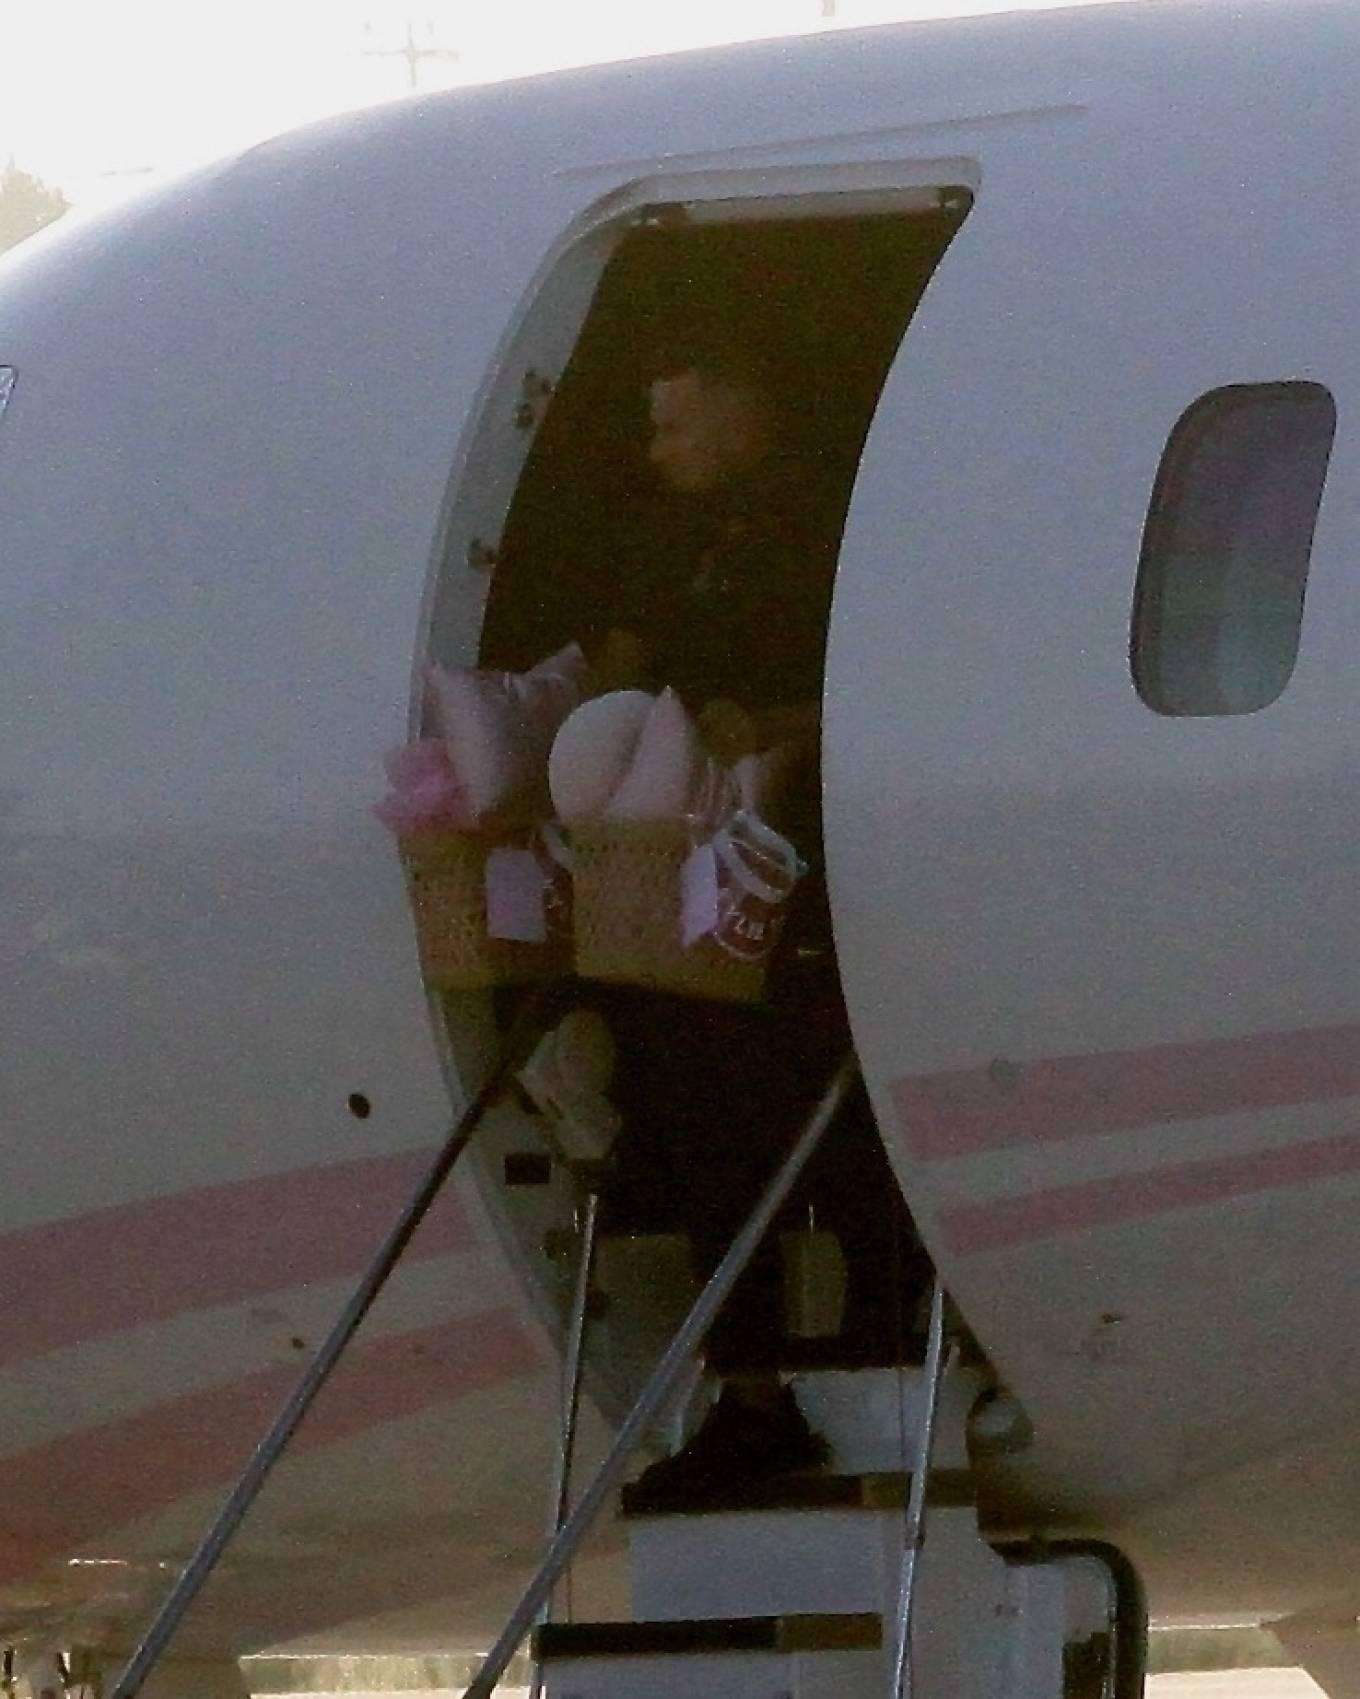 Khloe Kardashian 2020 : Khloe Kardashian and Kourtney Kardashian – Pictured boarding Kylie Jenners private jet in Van Nuys-09